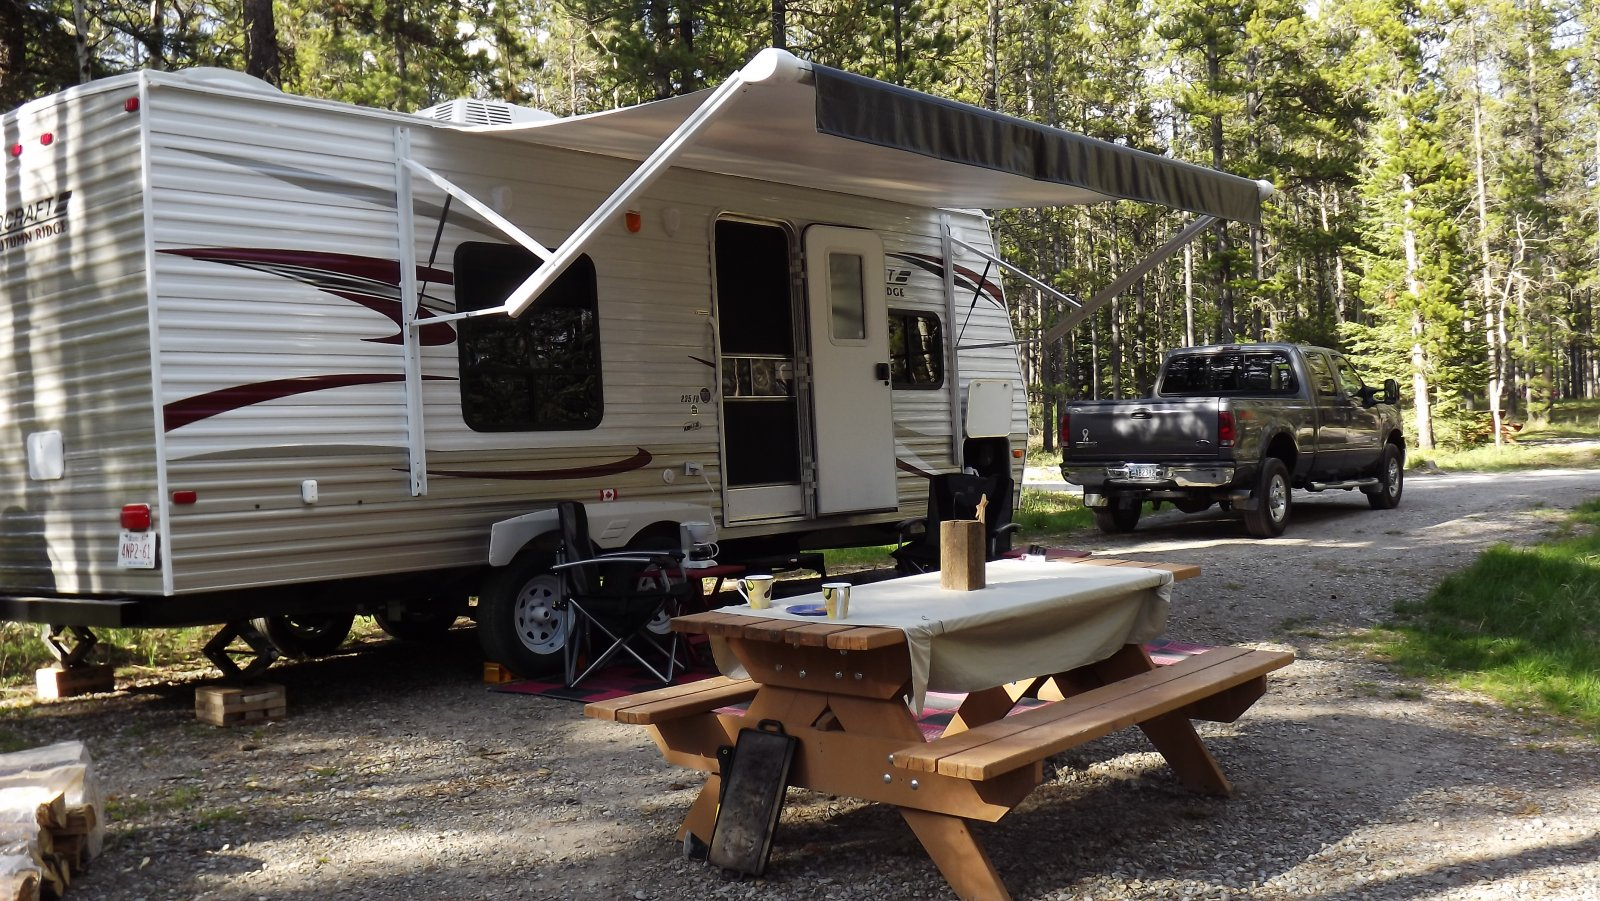 Click image for larger version  Name:Camping Sandy McNabb May 24 2015 070.jpg Views:215 Size:411.7 KB ID:99975